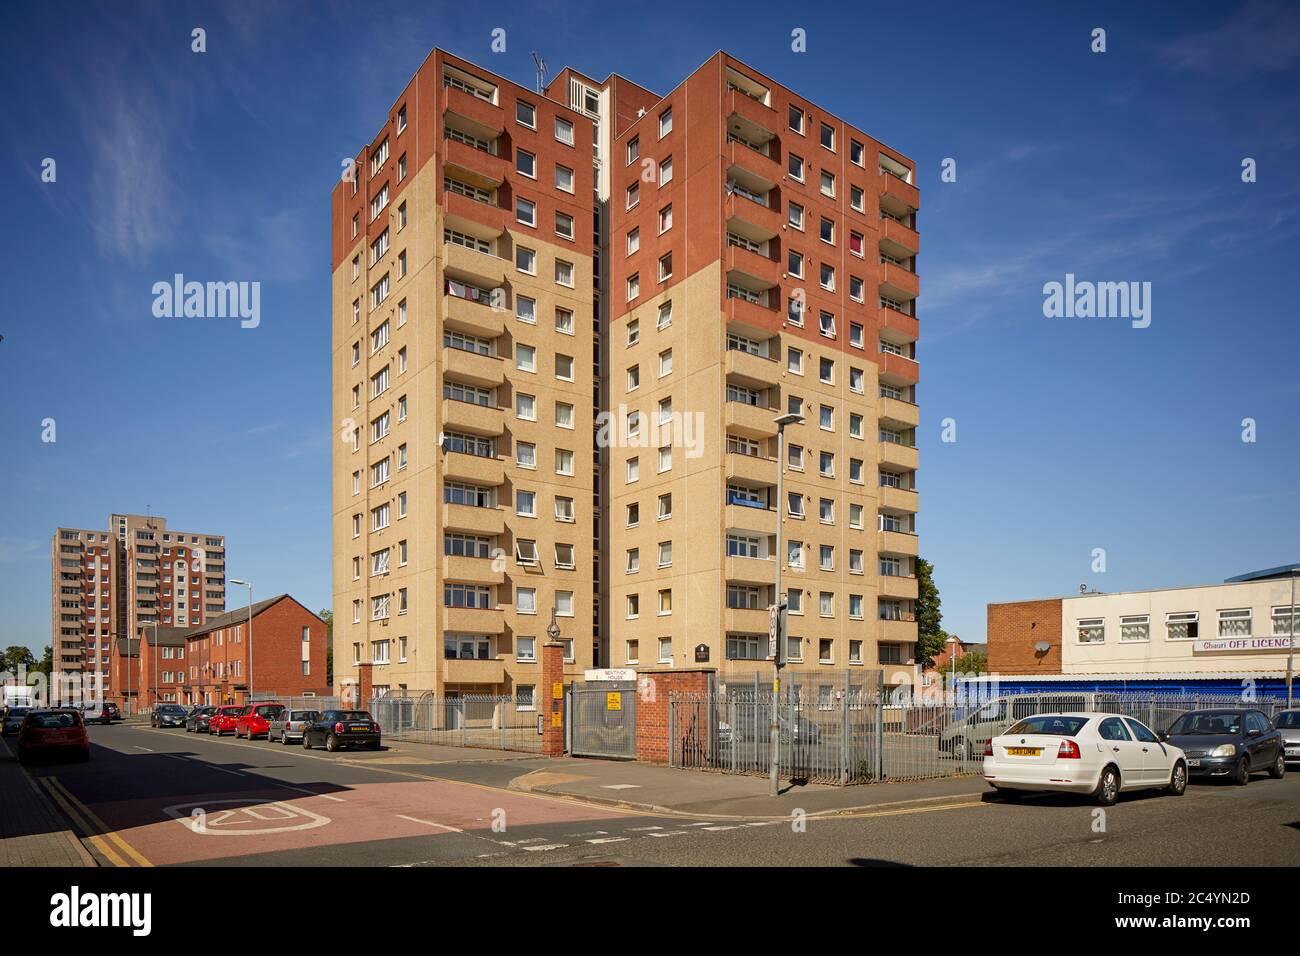 Ashton-under-Lyne town centre flats Portland House a 13-story hi-rise building Stock Photo